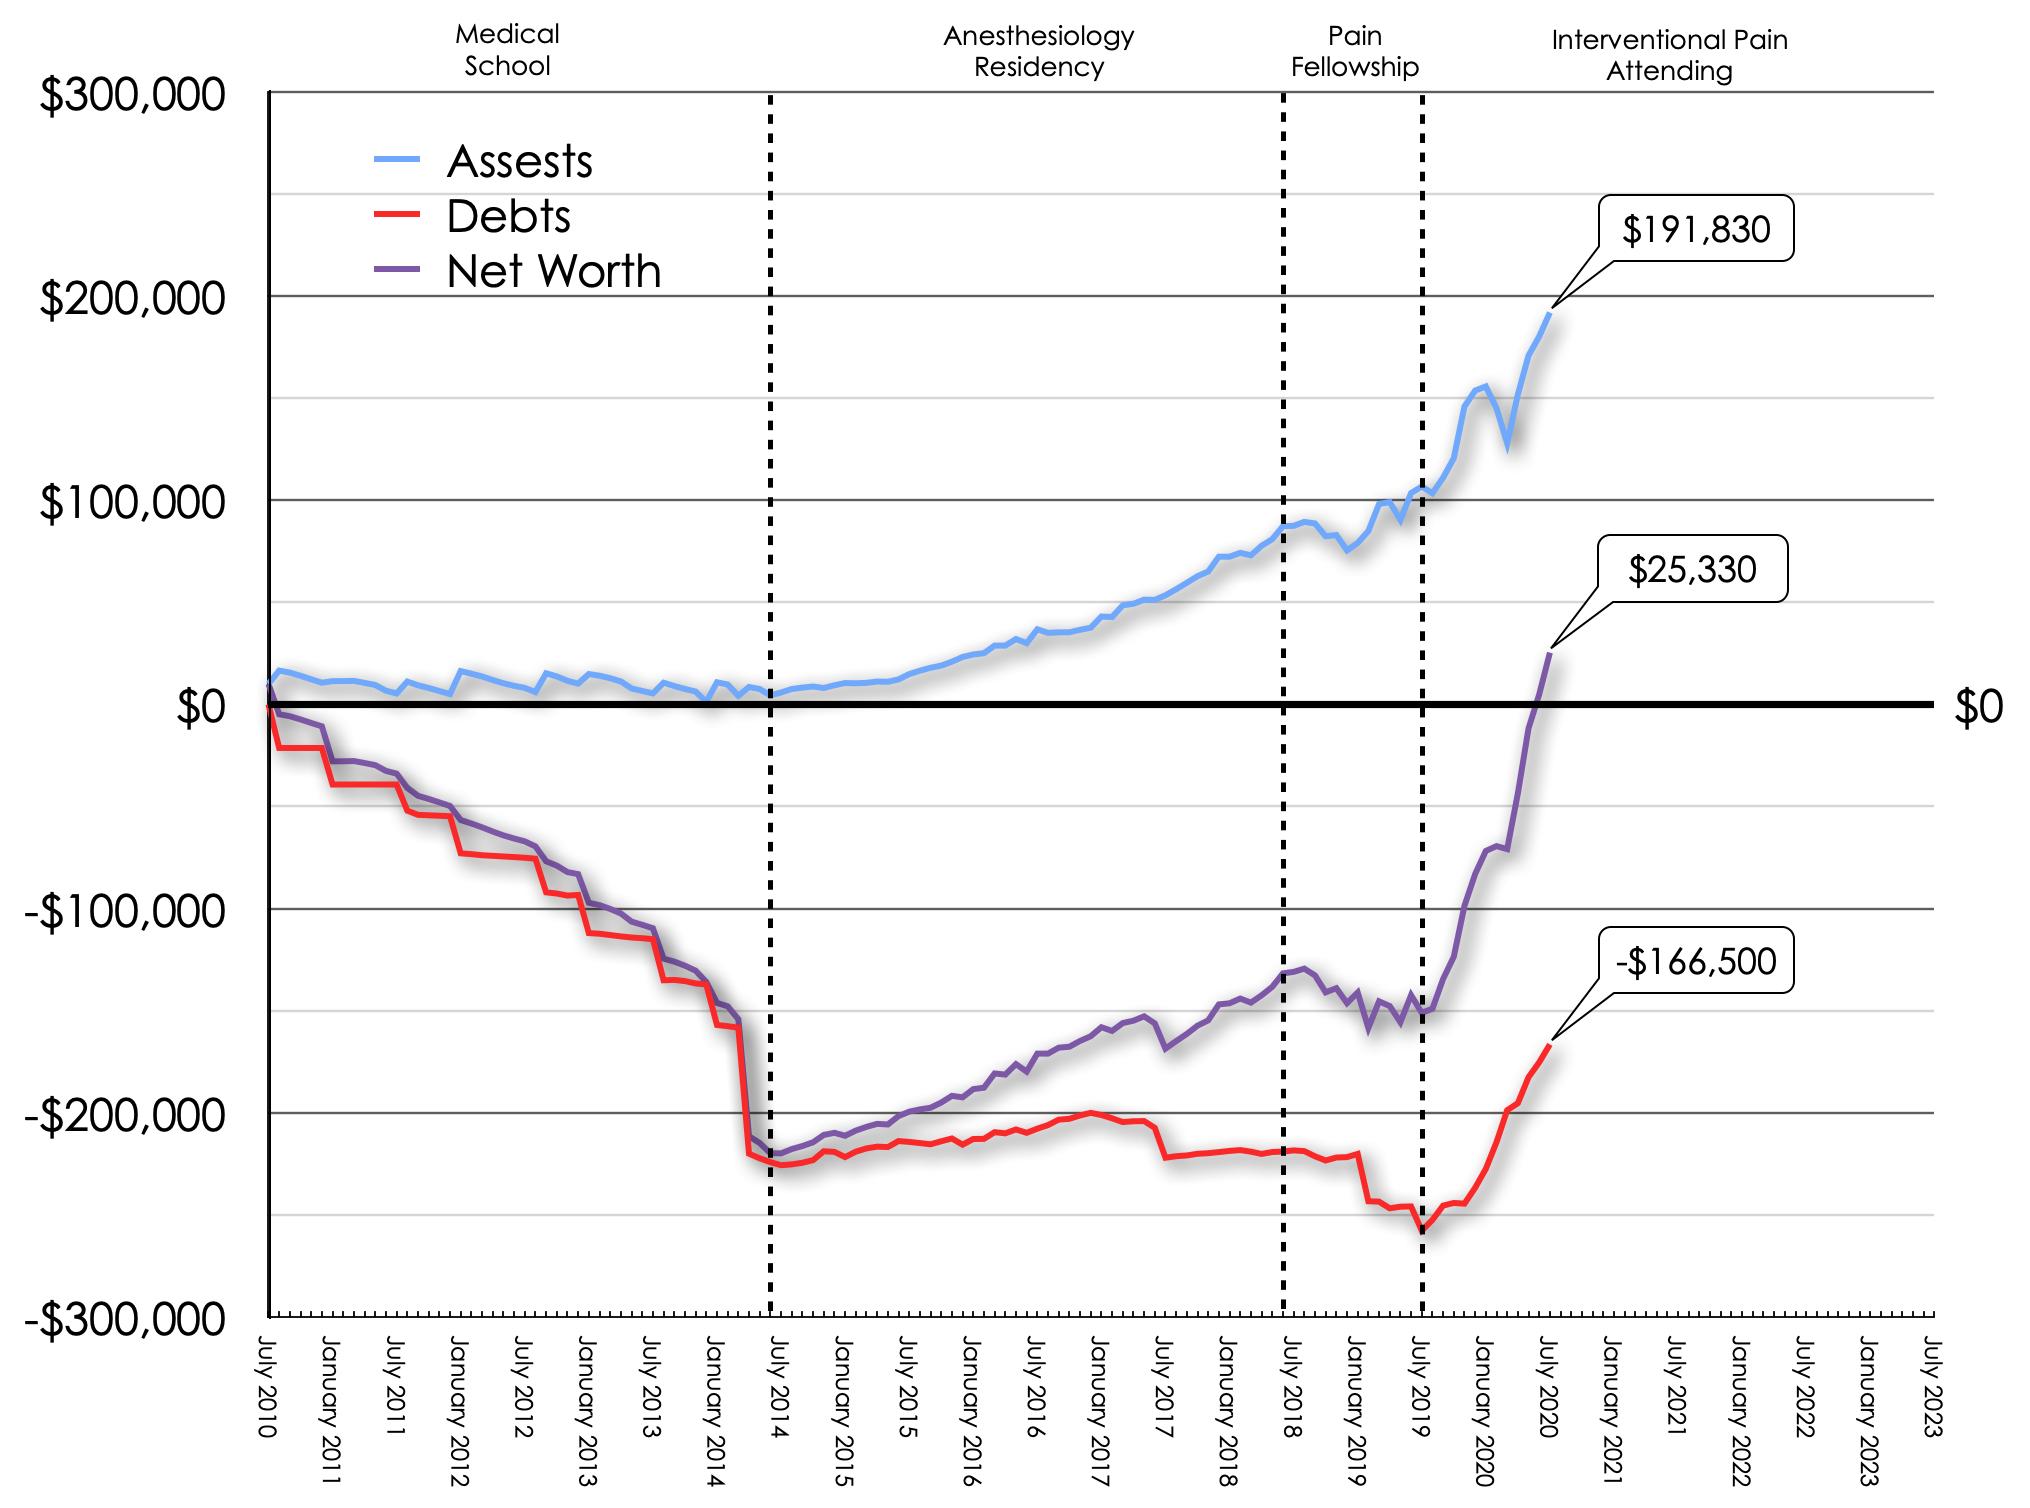 July 2020 Net Worth Trend